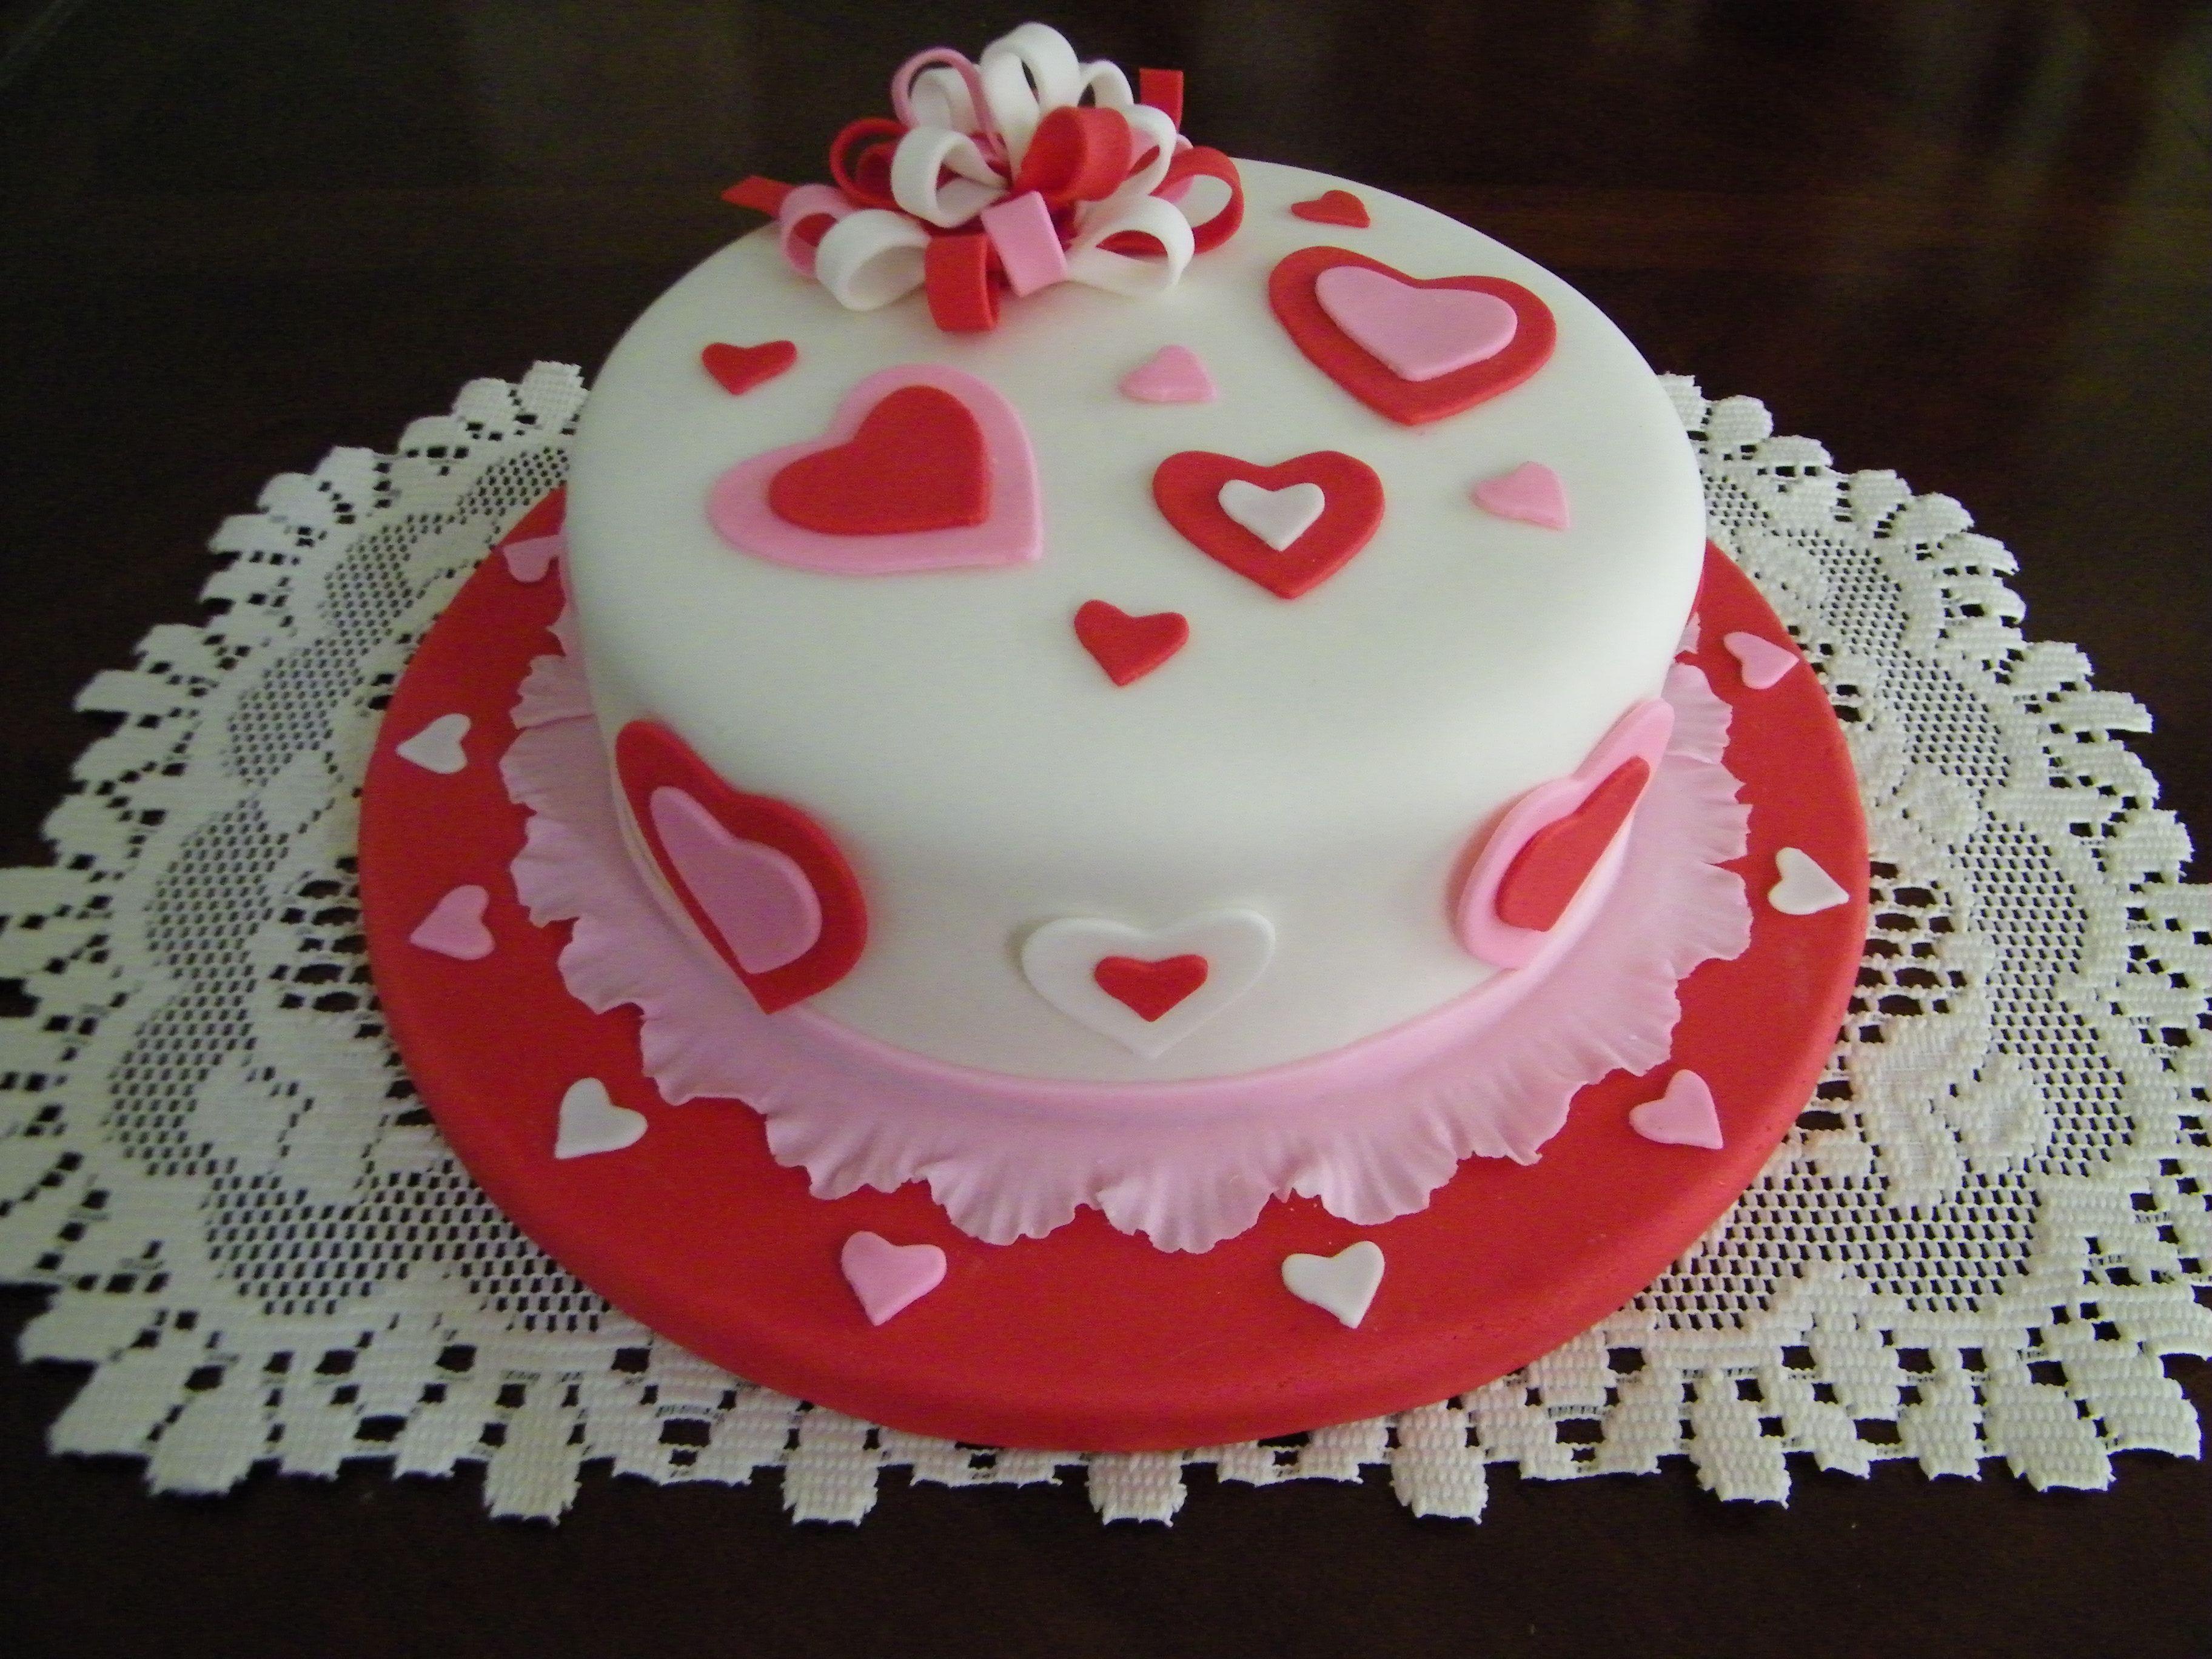 Valentine S Day Cake Torta De San Valentin Tortas Modelos De